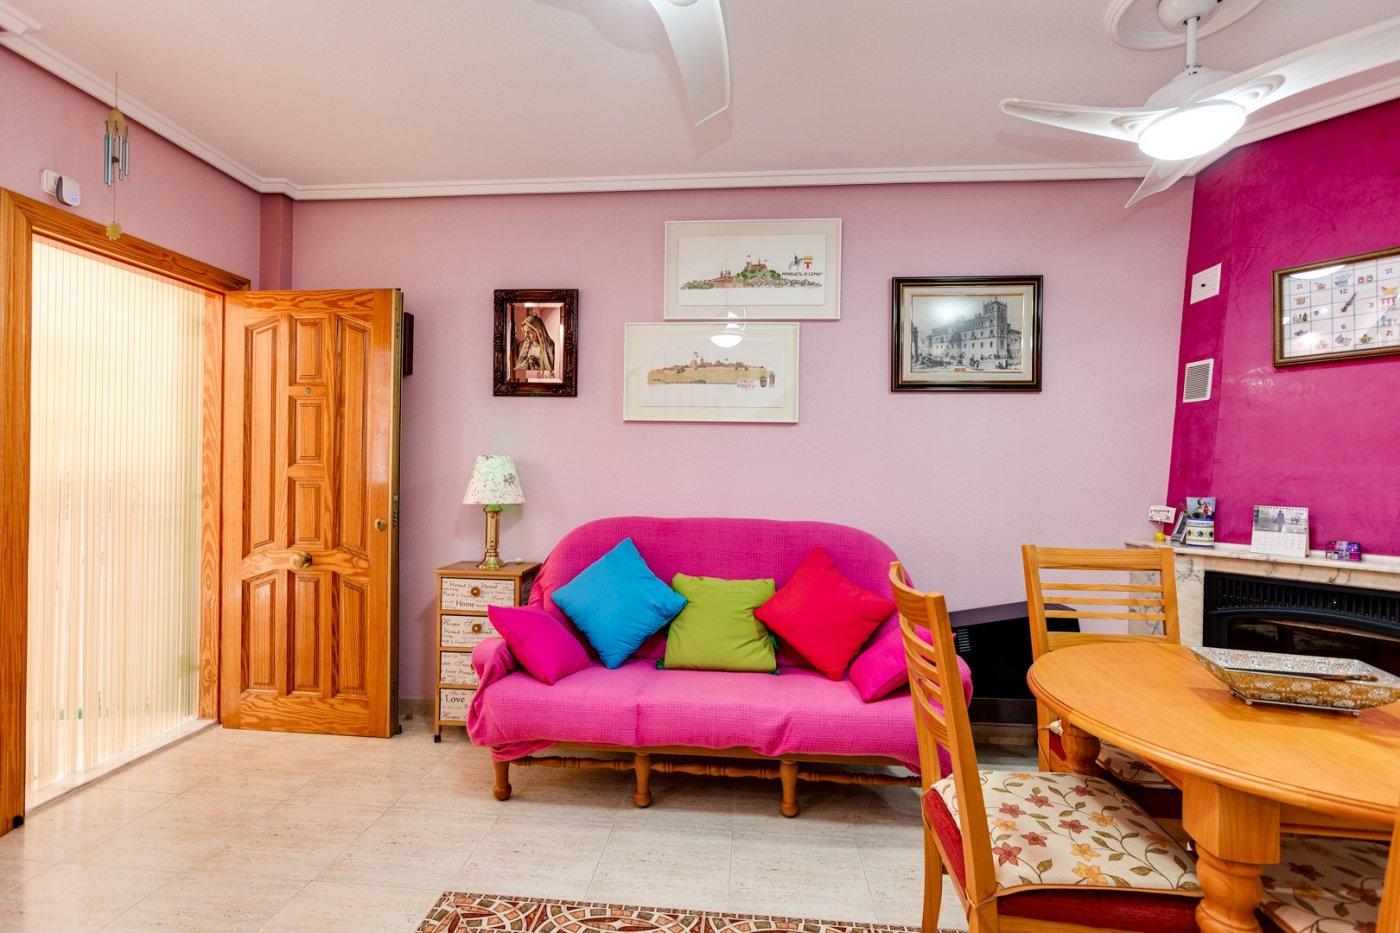 3 BEDROOM + 2 BATHROOM HOUSE + PORCH + SUNROOF TERRACE +  POOL, PUEBLO CENTRO AREA, TORREVIEJA